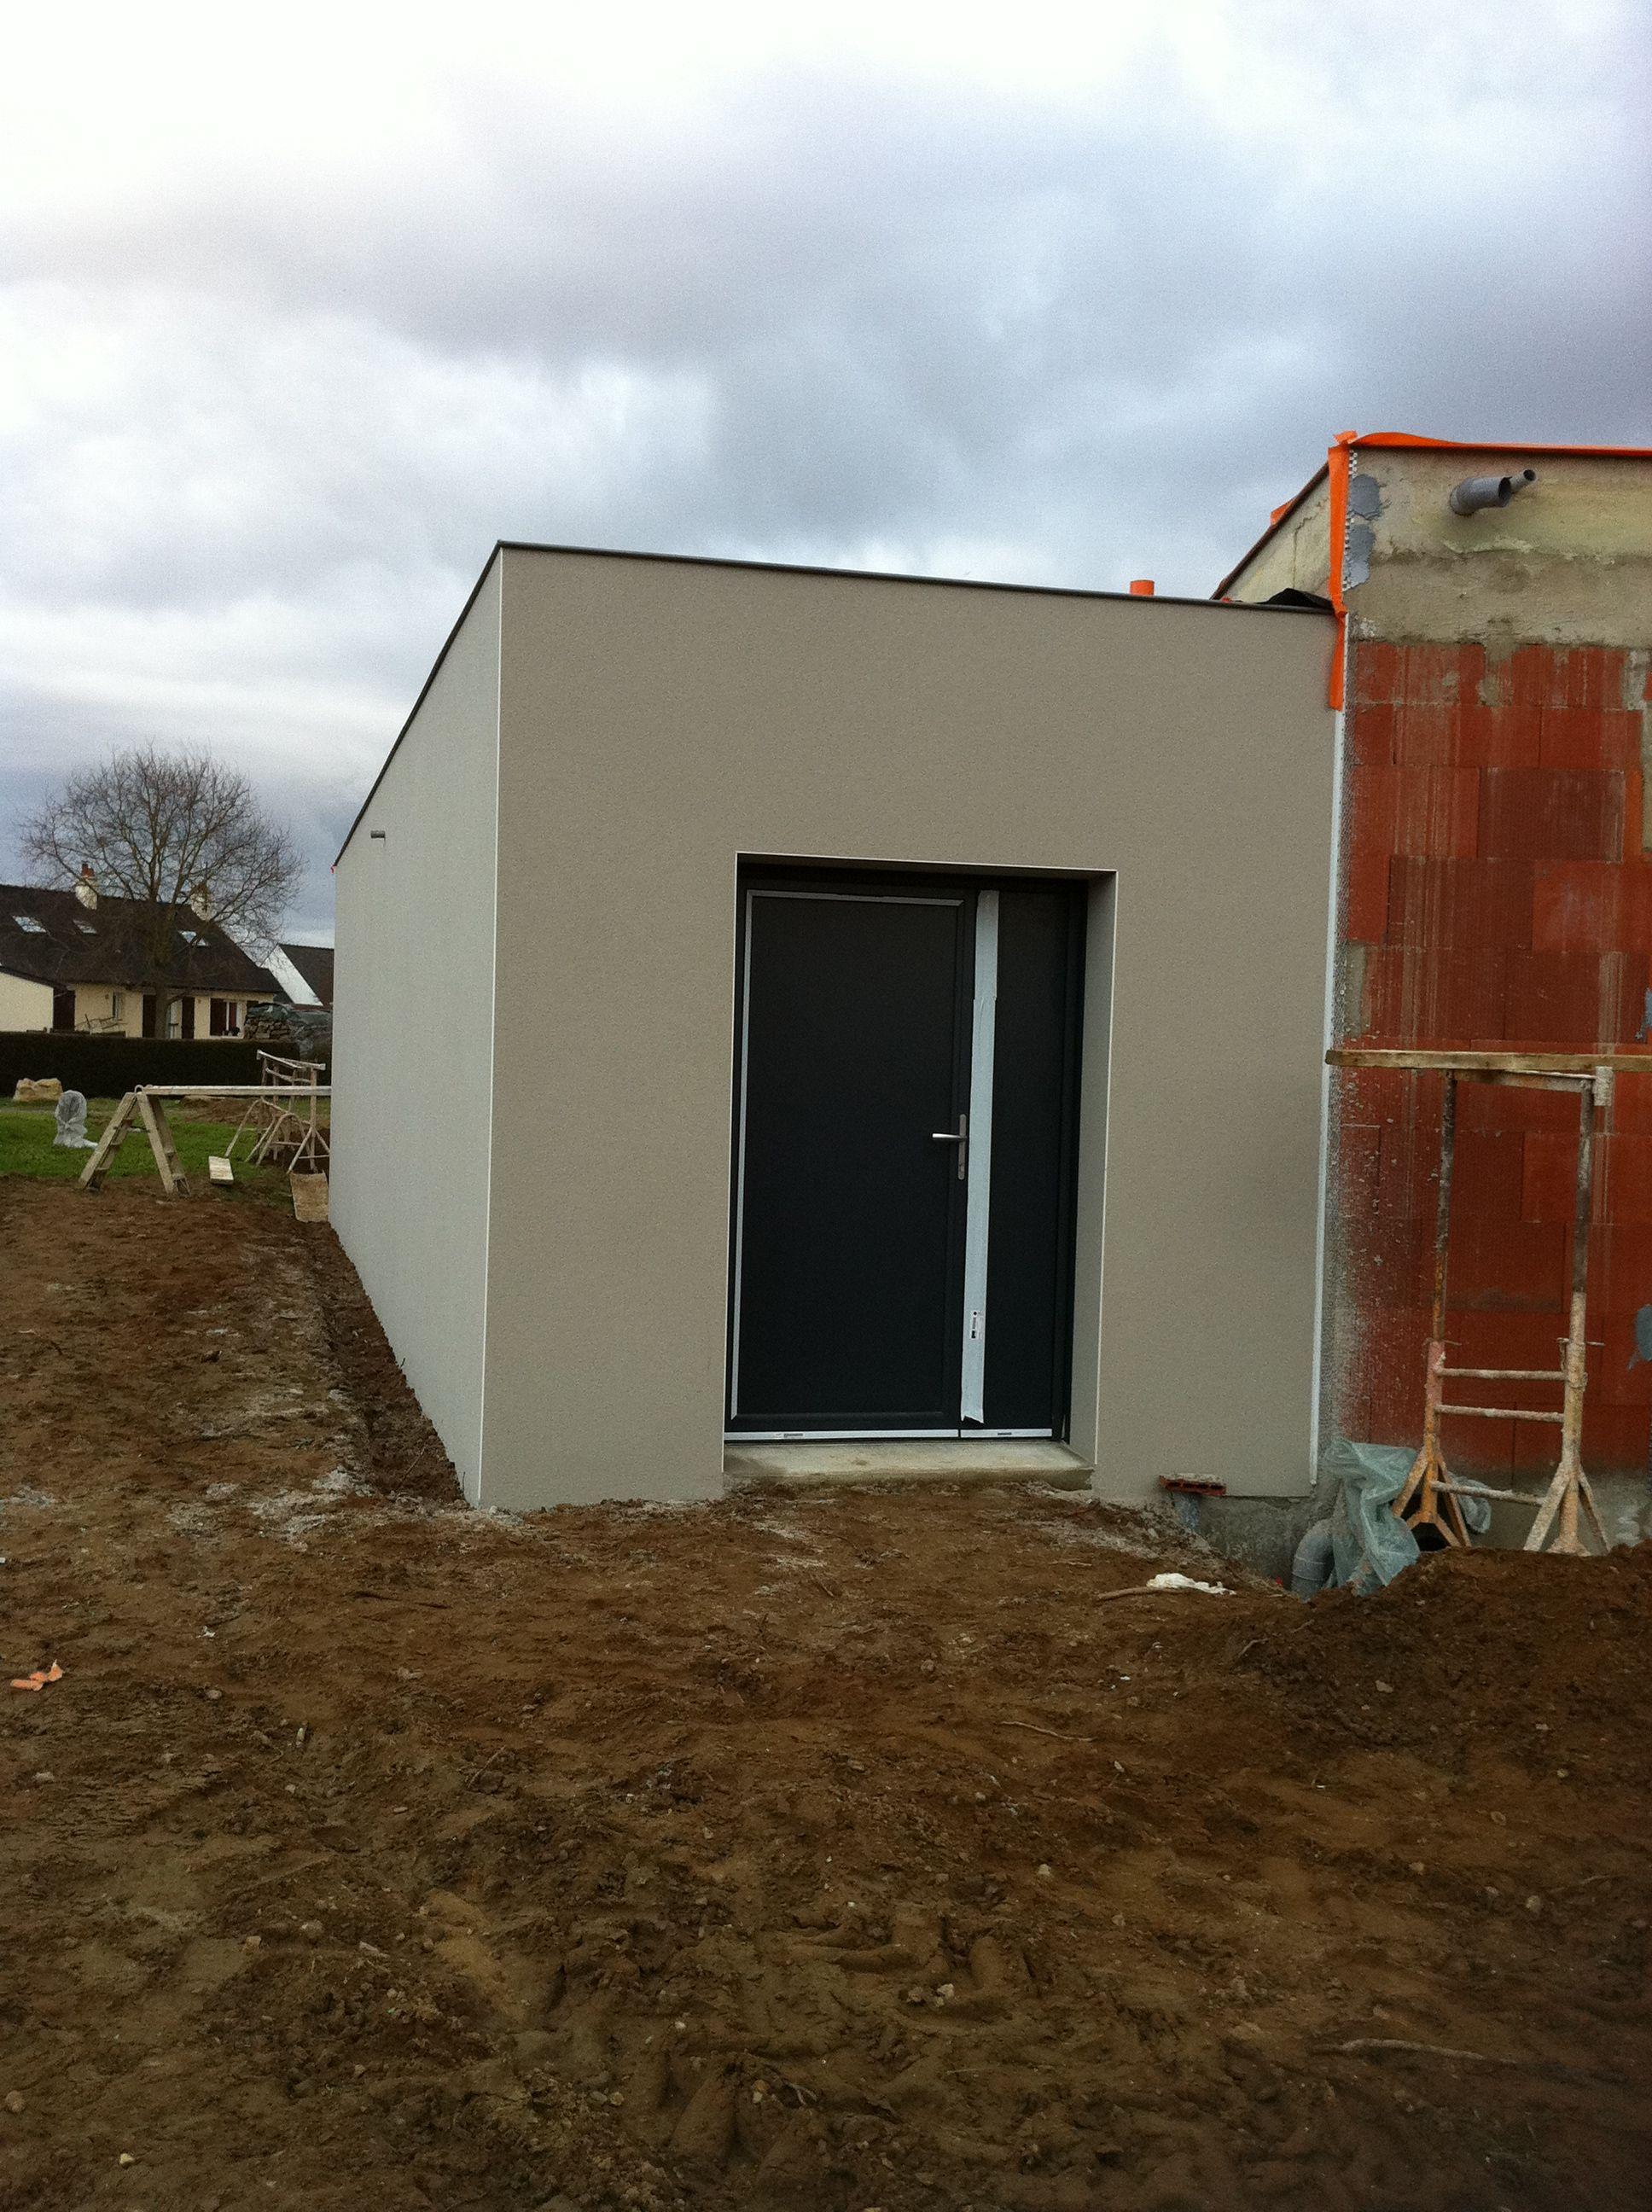 La saga de la casa toit plat page 10 - Mur privatif en limite de propriete ...